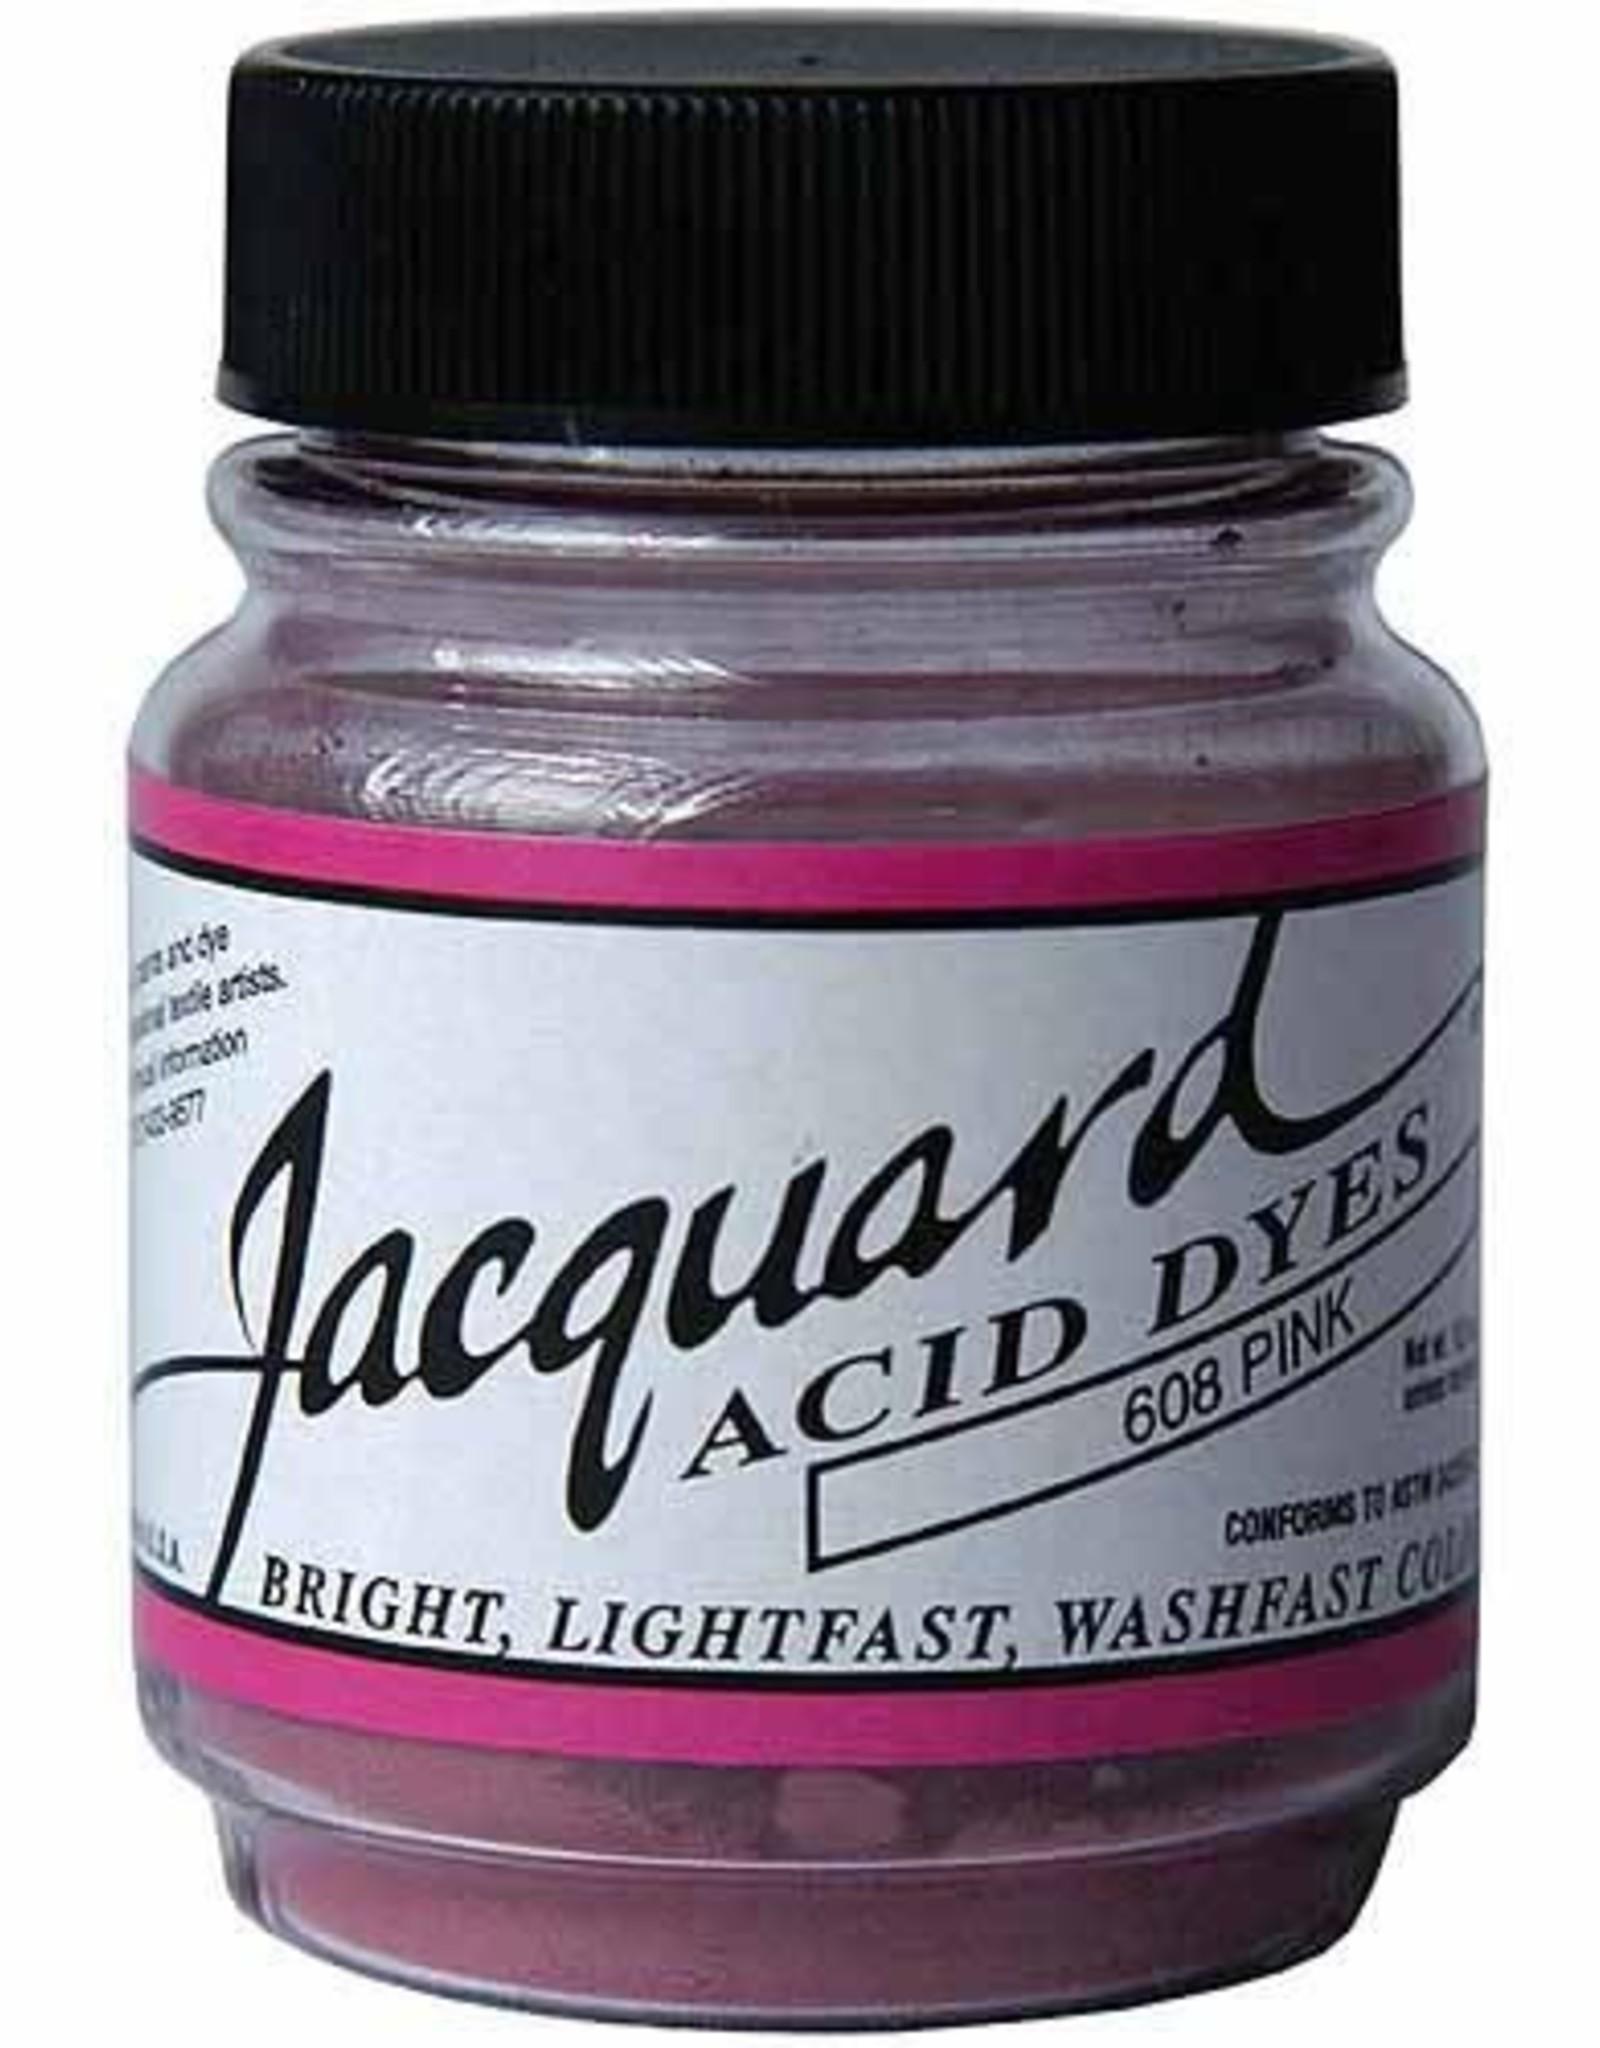 Jacquard Jacquard Acid Dye Pink